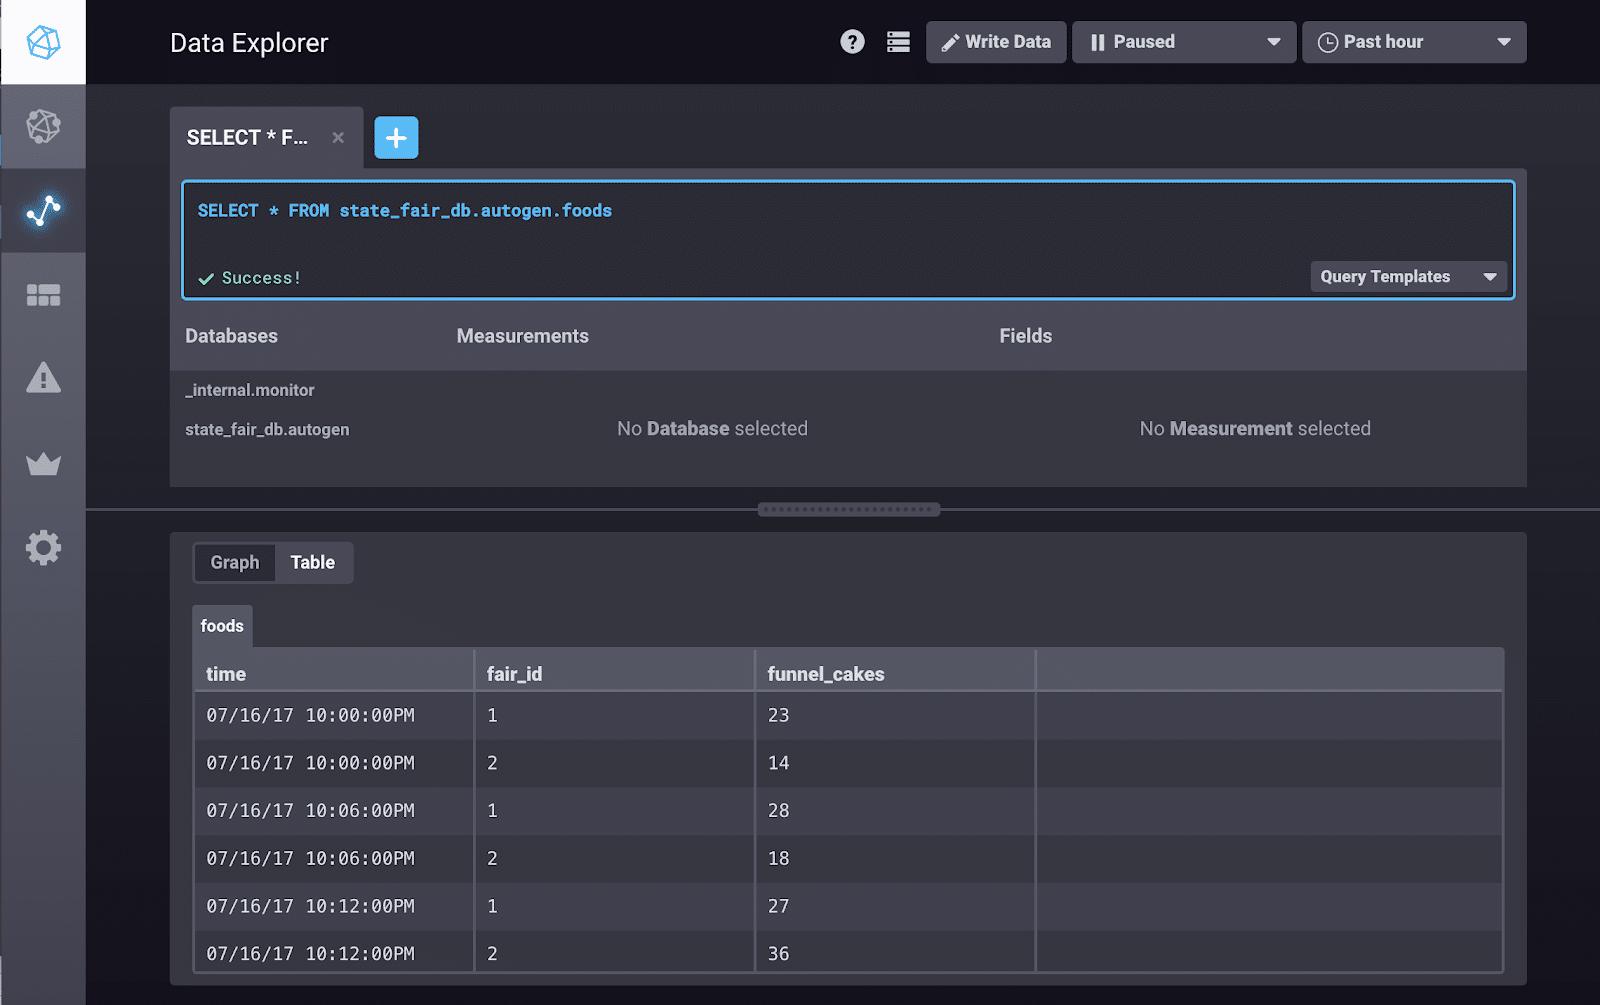 InfluxDB Data Explorer ad hoc analysis